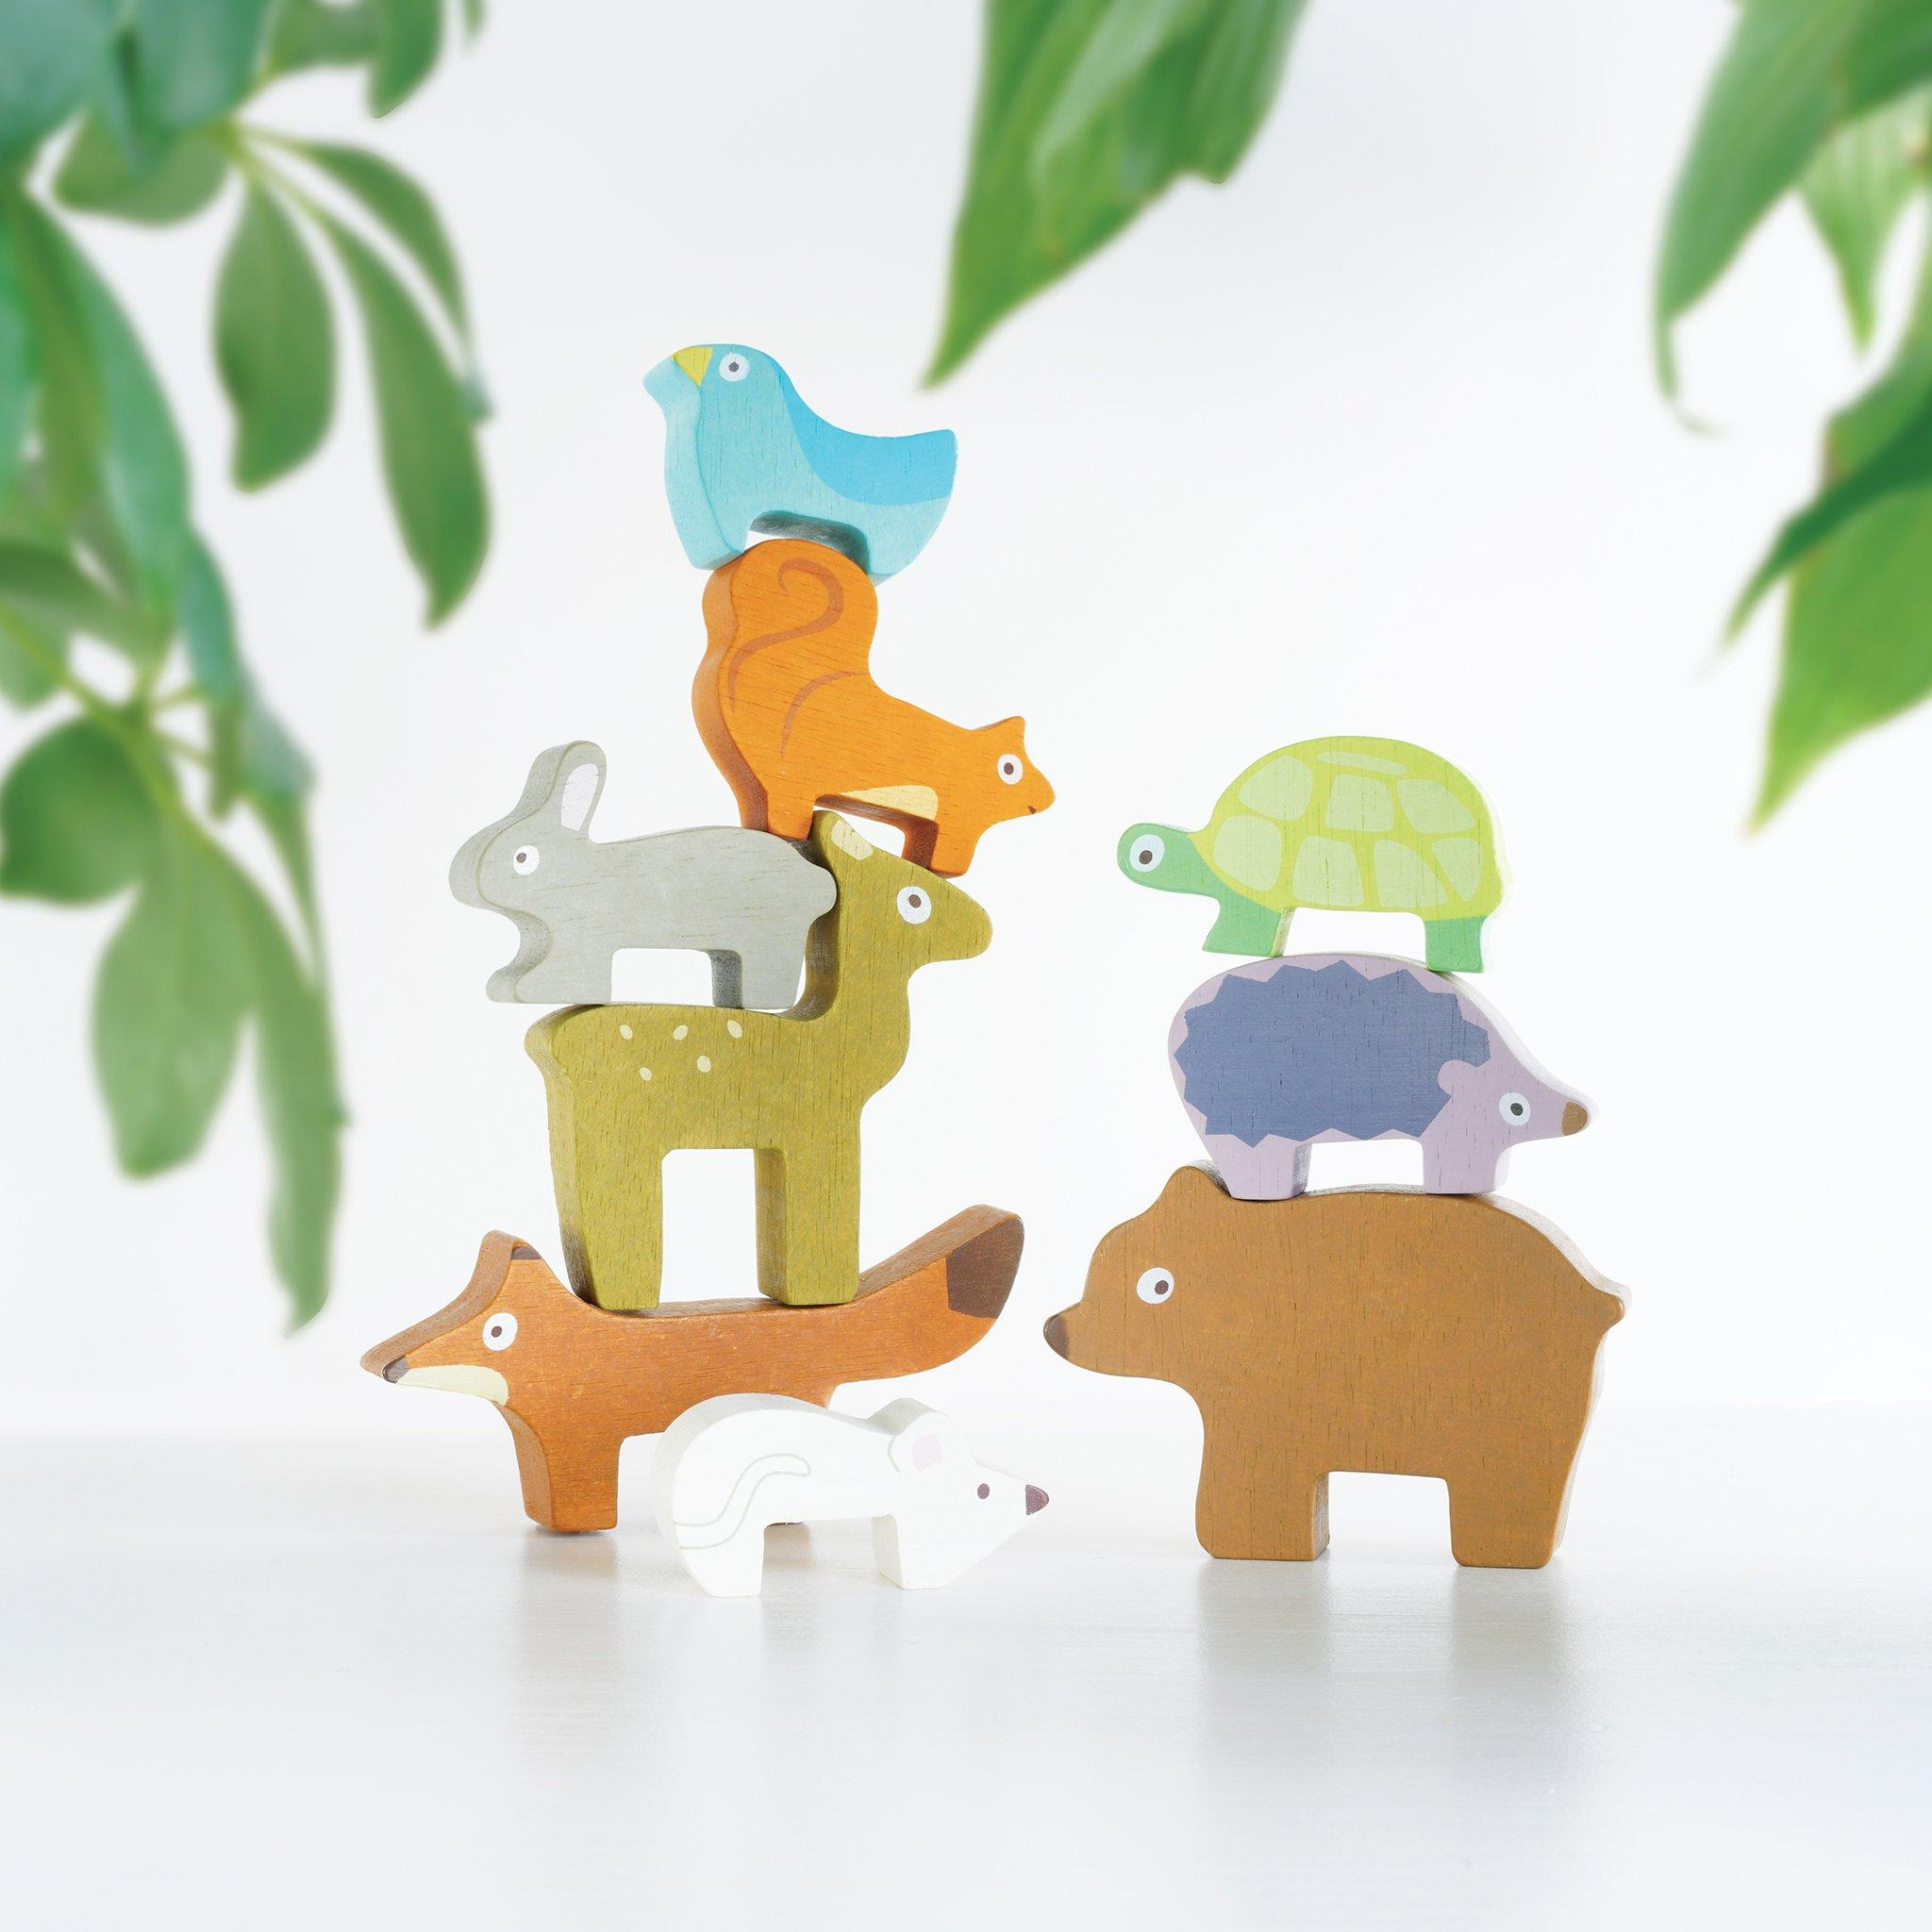 Le Toy Van Wooden Petilou Forest Stacker